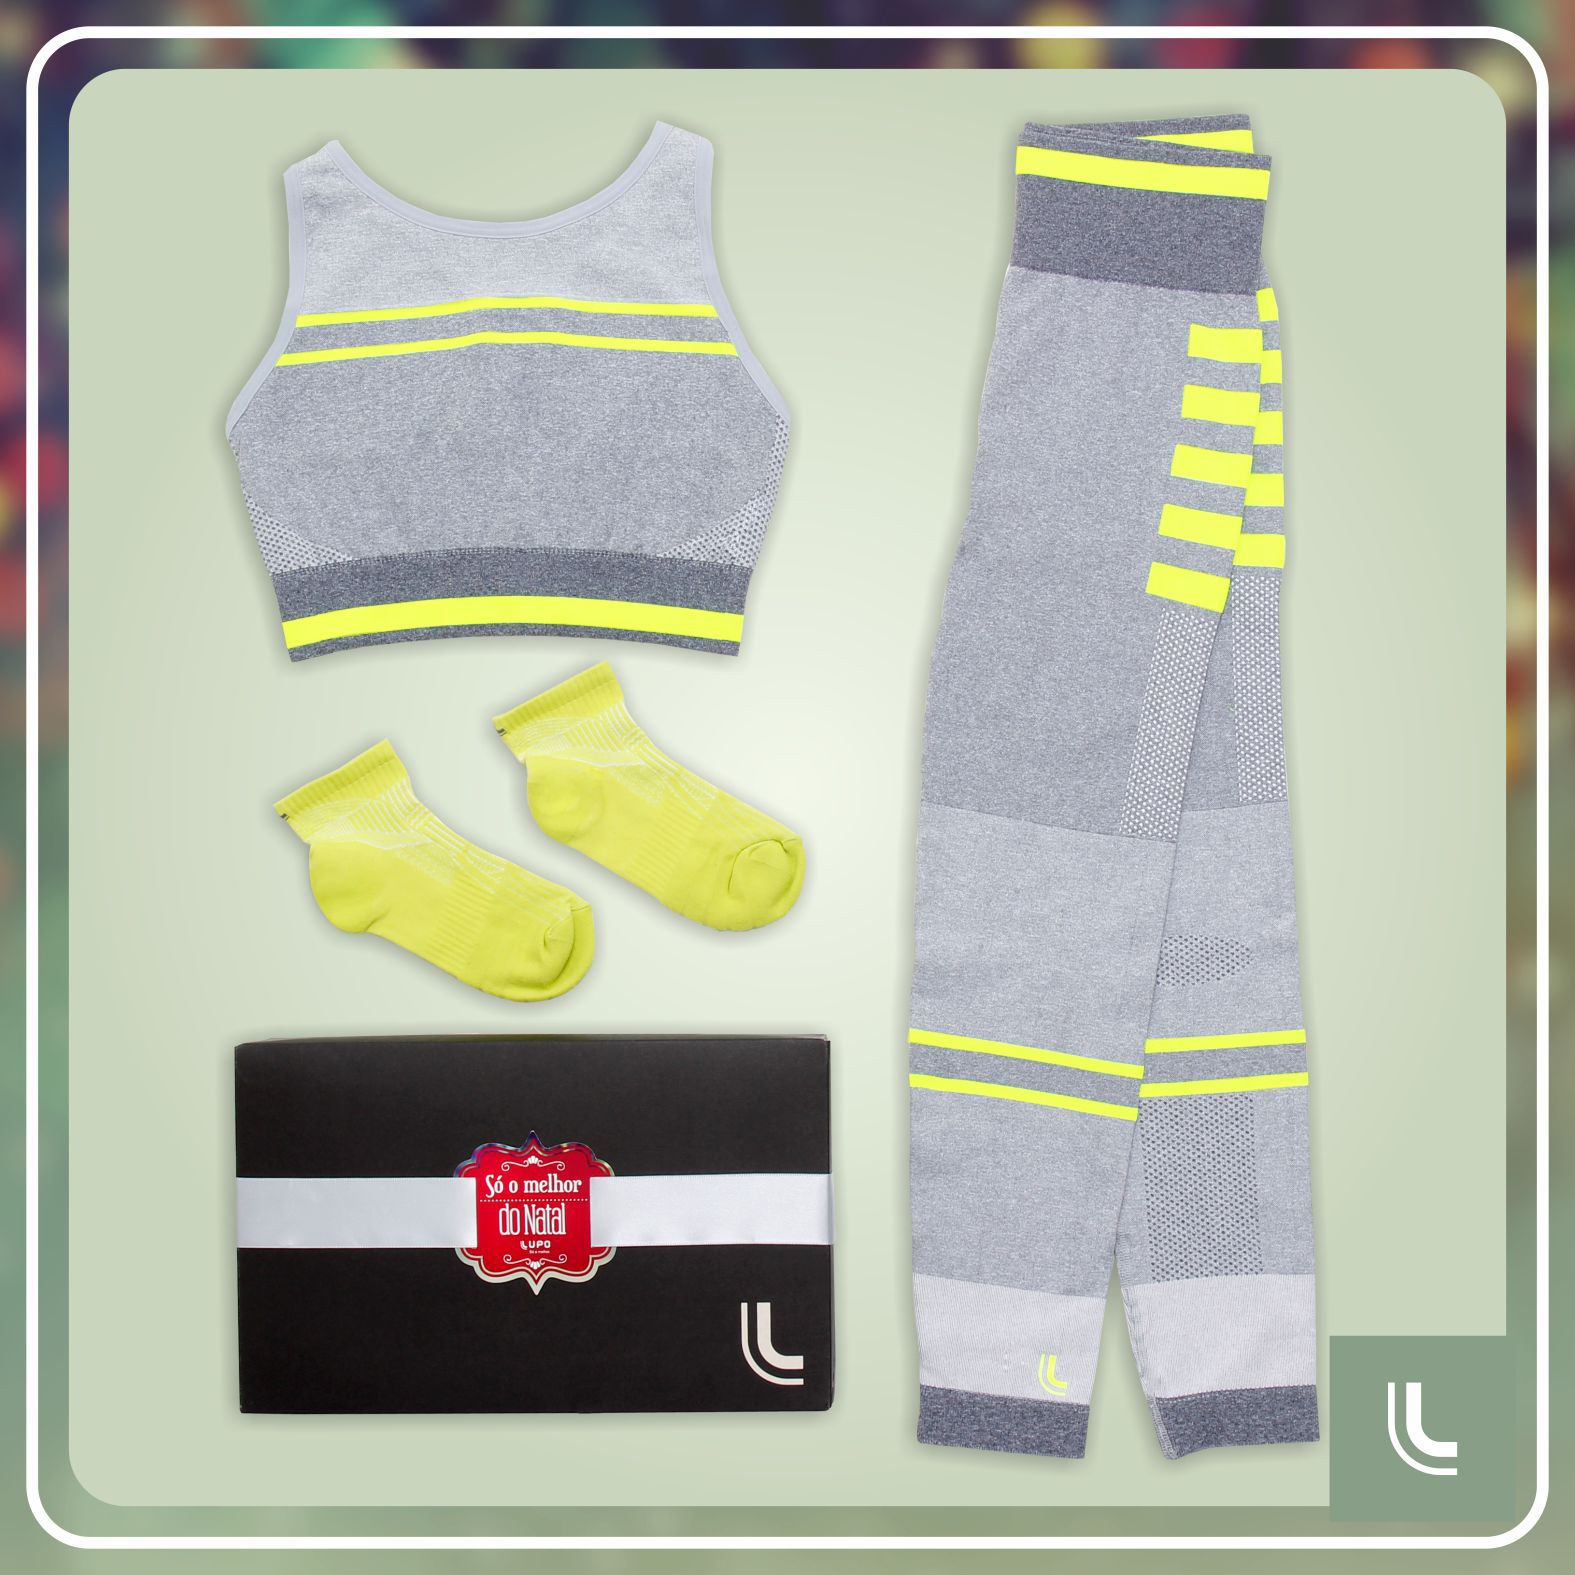 7912c5fb8 Presente perfeito para a amiga corredora  kit Lupo Sport. Corre para a loja  Lupo